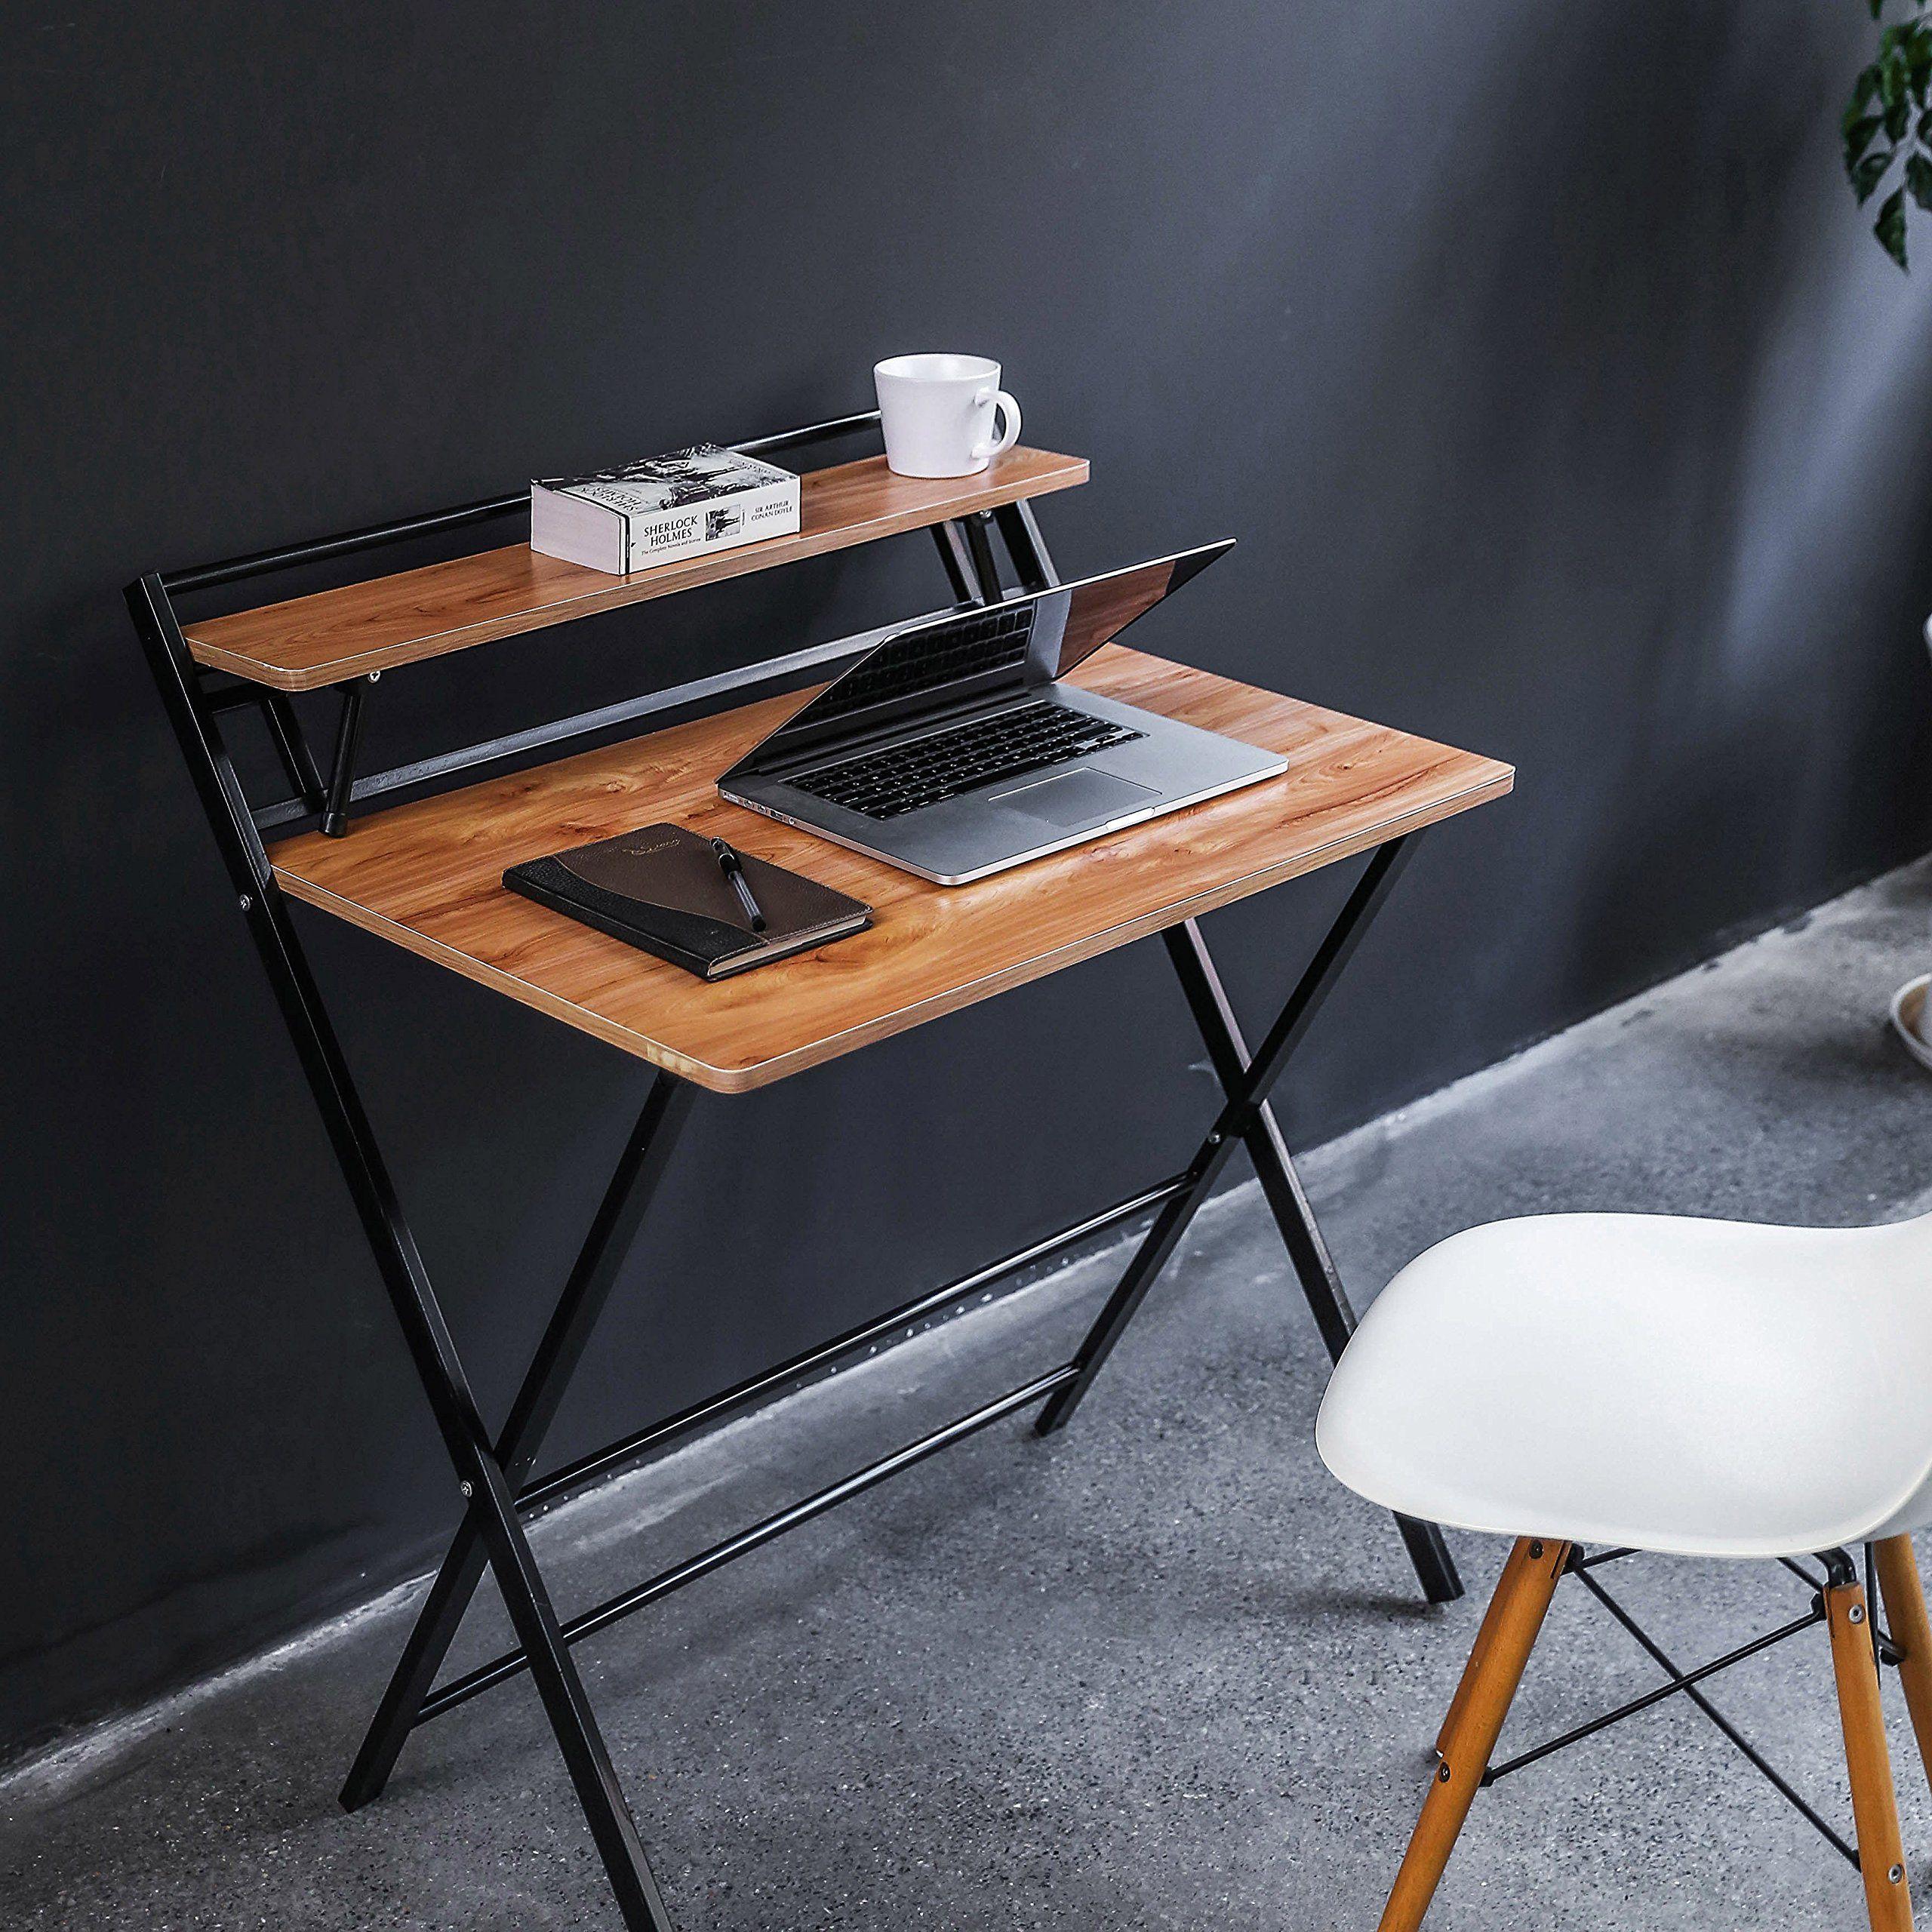 Jiwu 2 Form Folding Study Desk For Small Space Home Corner Desks Simple Computer Desk Laptop Writing Table Desks For Small Spaces Small Study Table Simple Desk Folding desks for small spaces